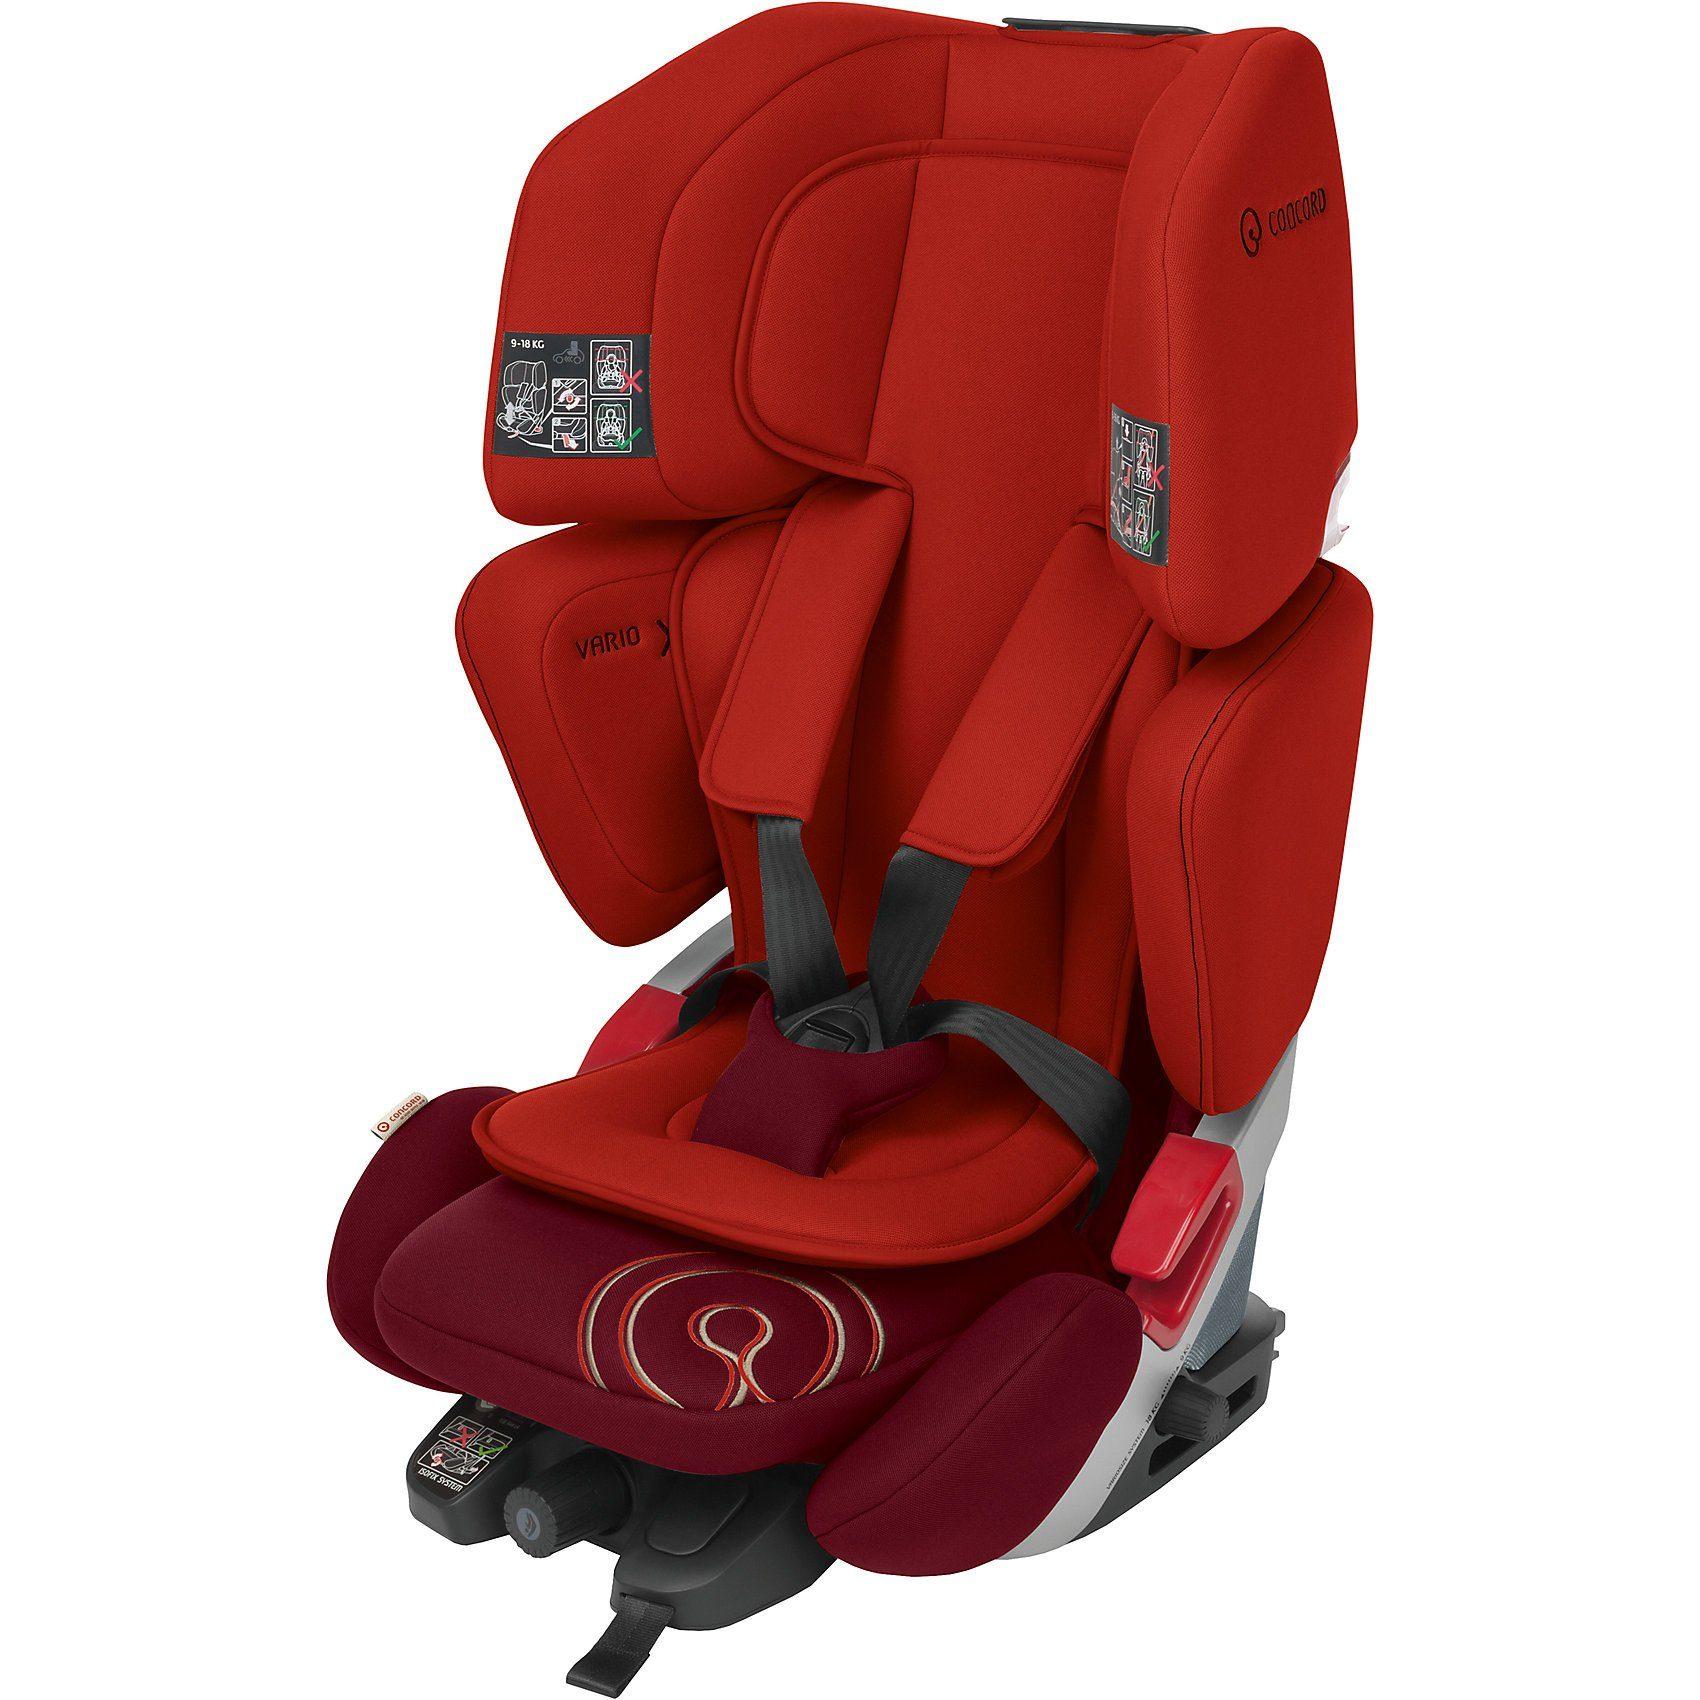 Concord Auto-Kindersitz Vario XT-5 Flaming Red, 2018